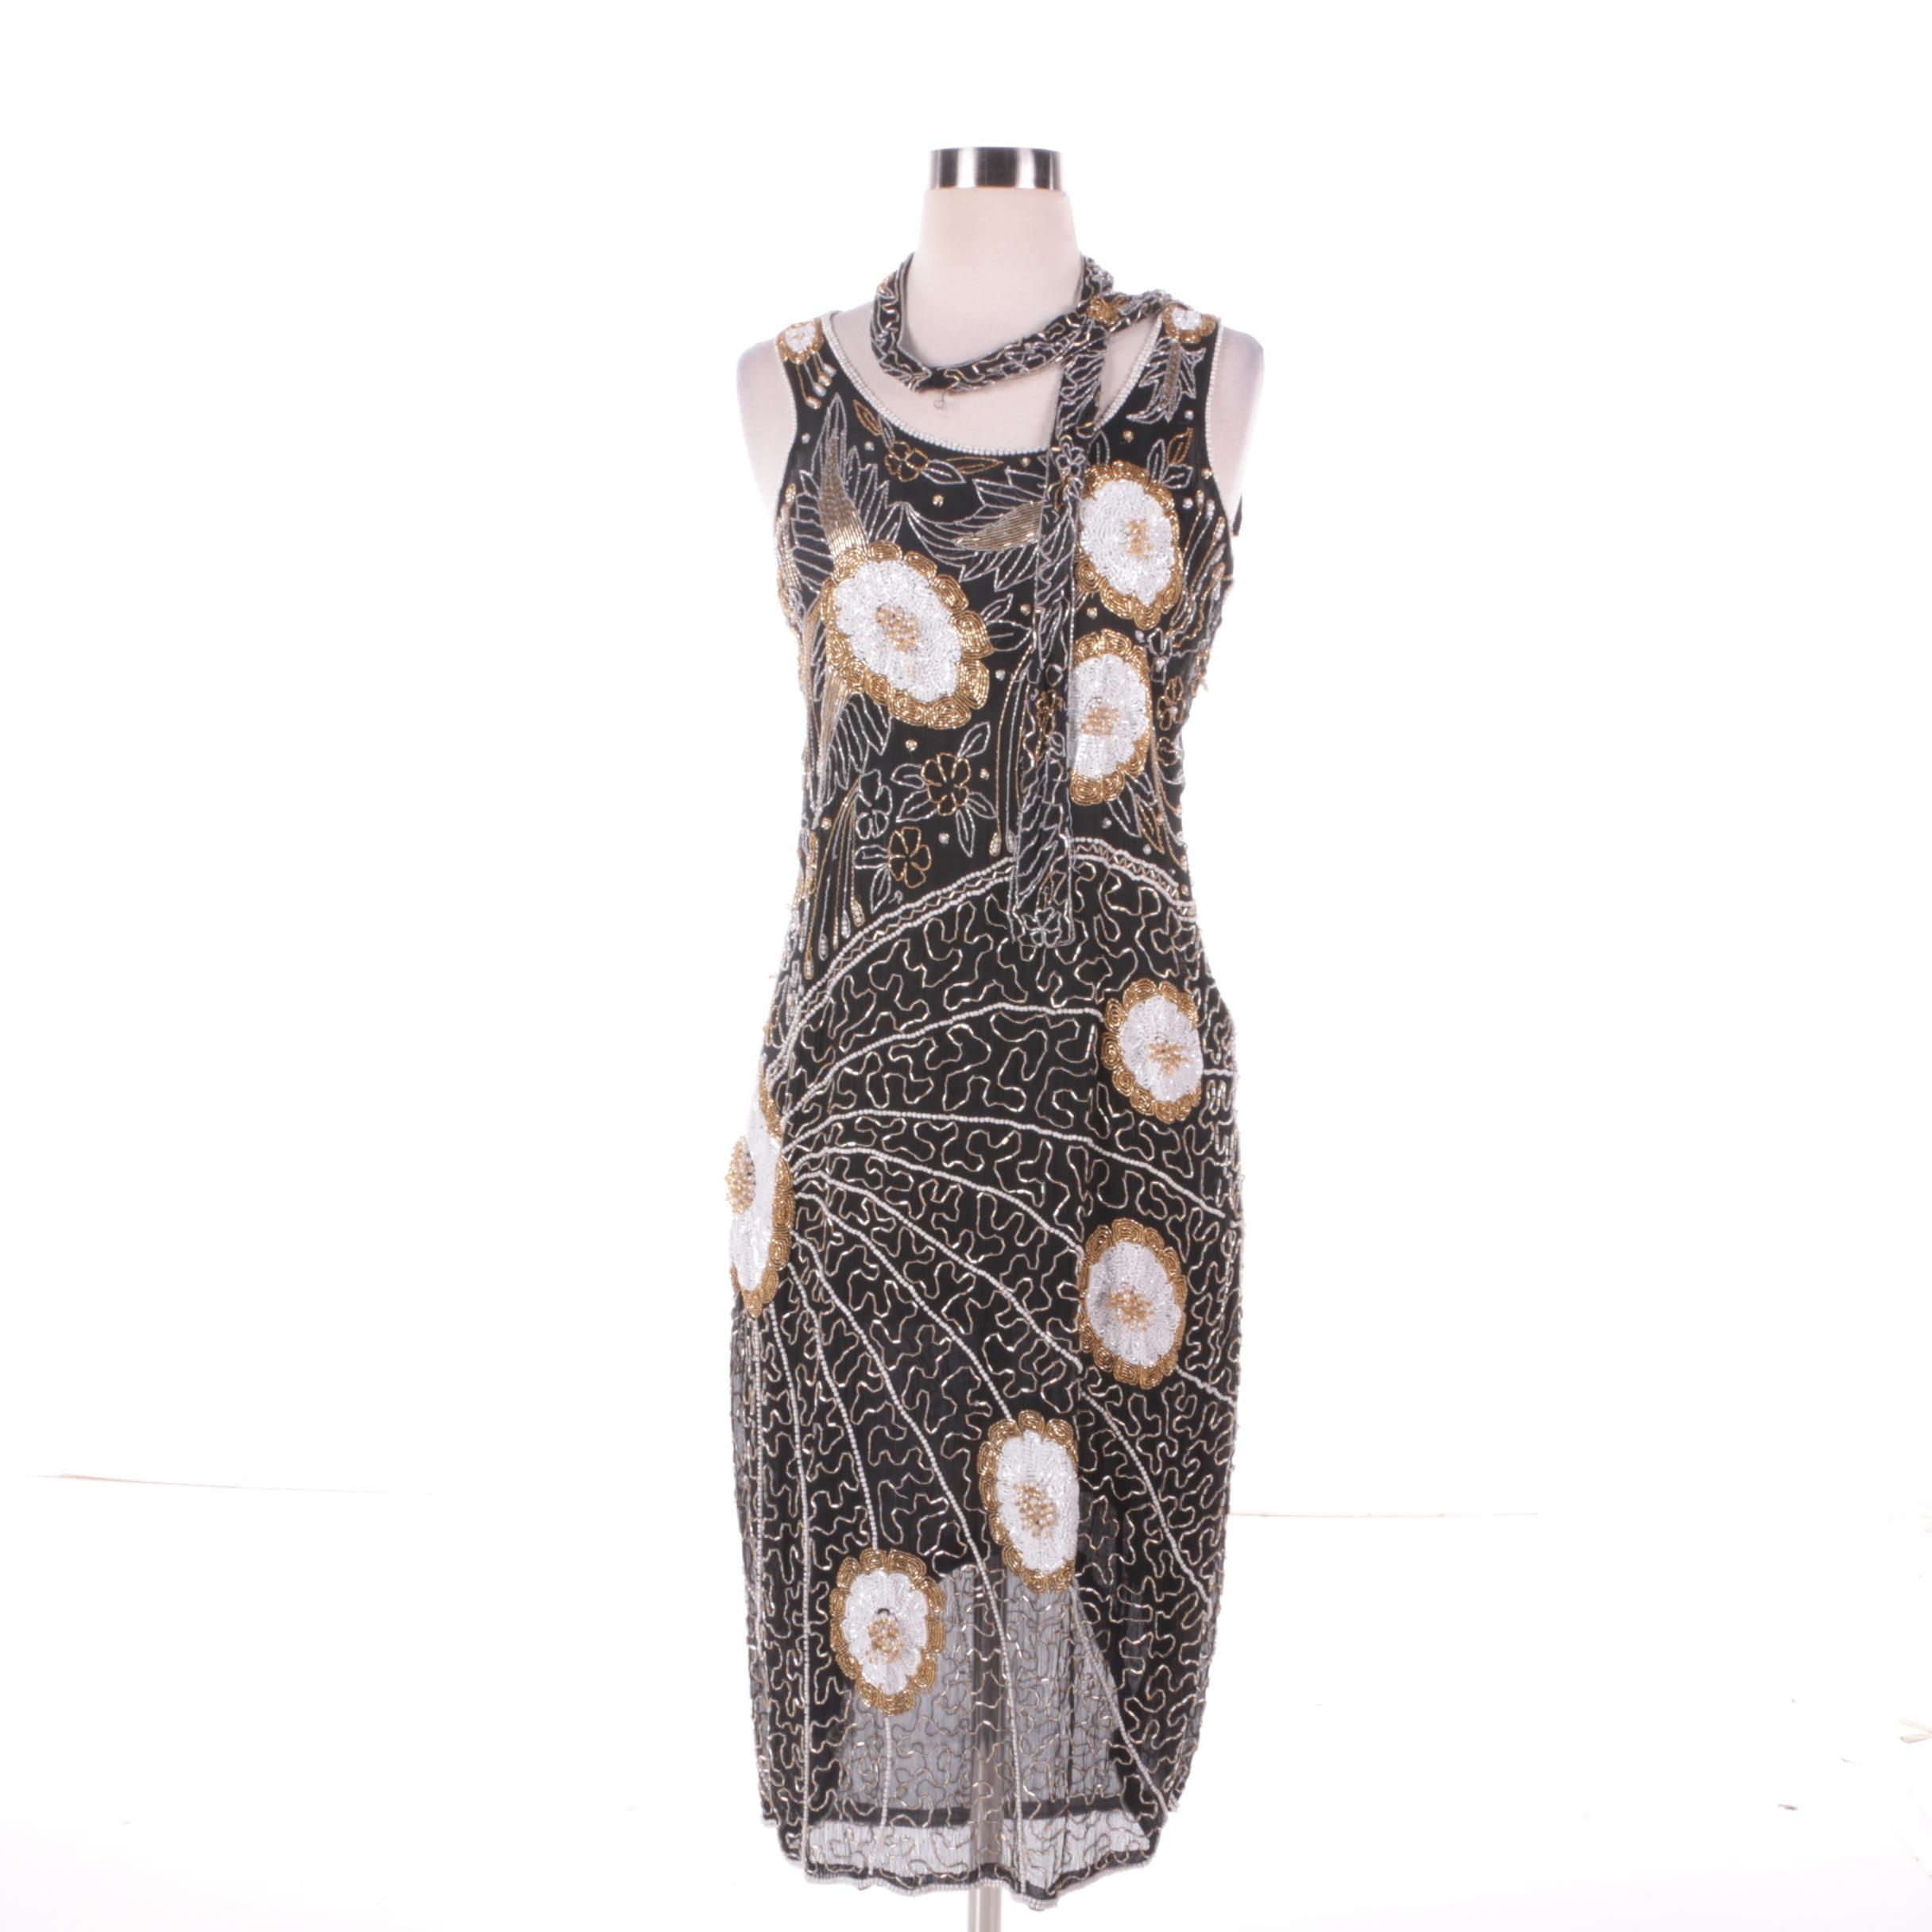 1980s Vintage Silk Beaded Peacock Burst Sleeveless Cocktail Dress